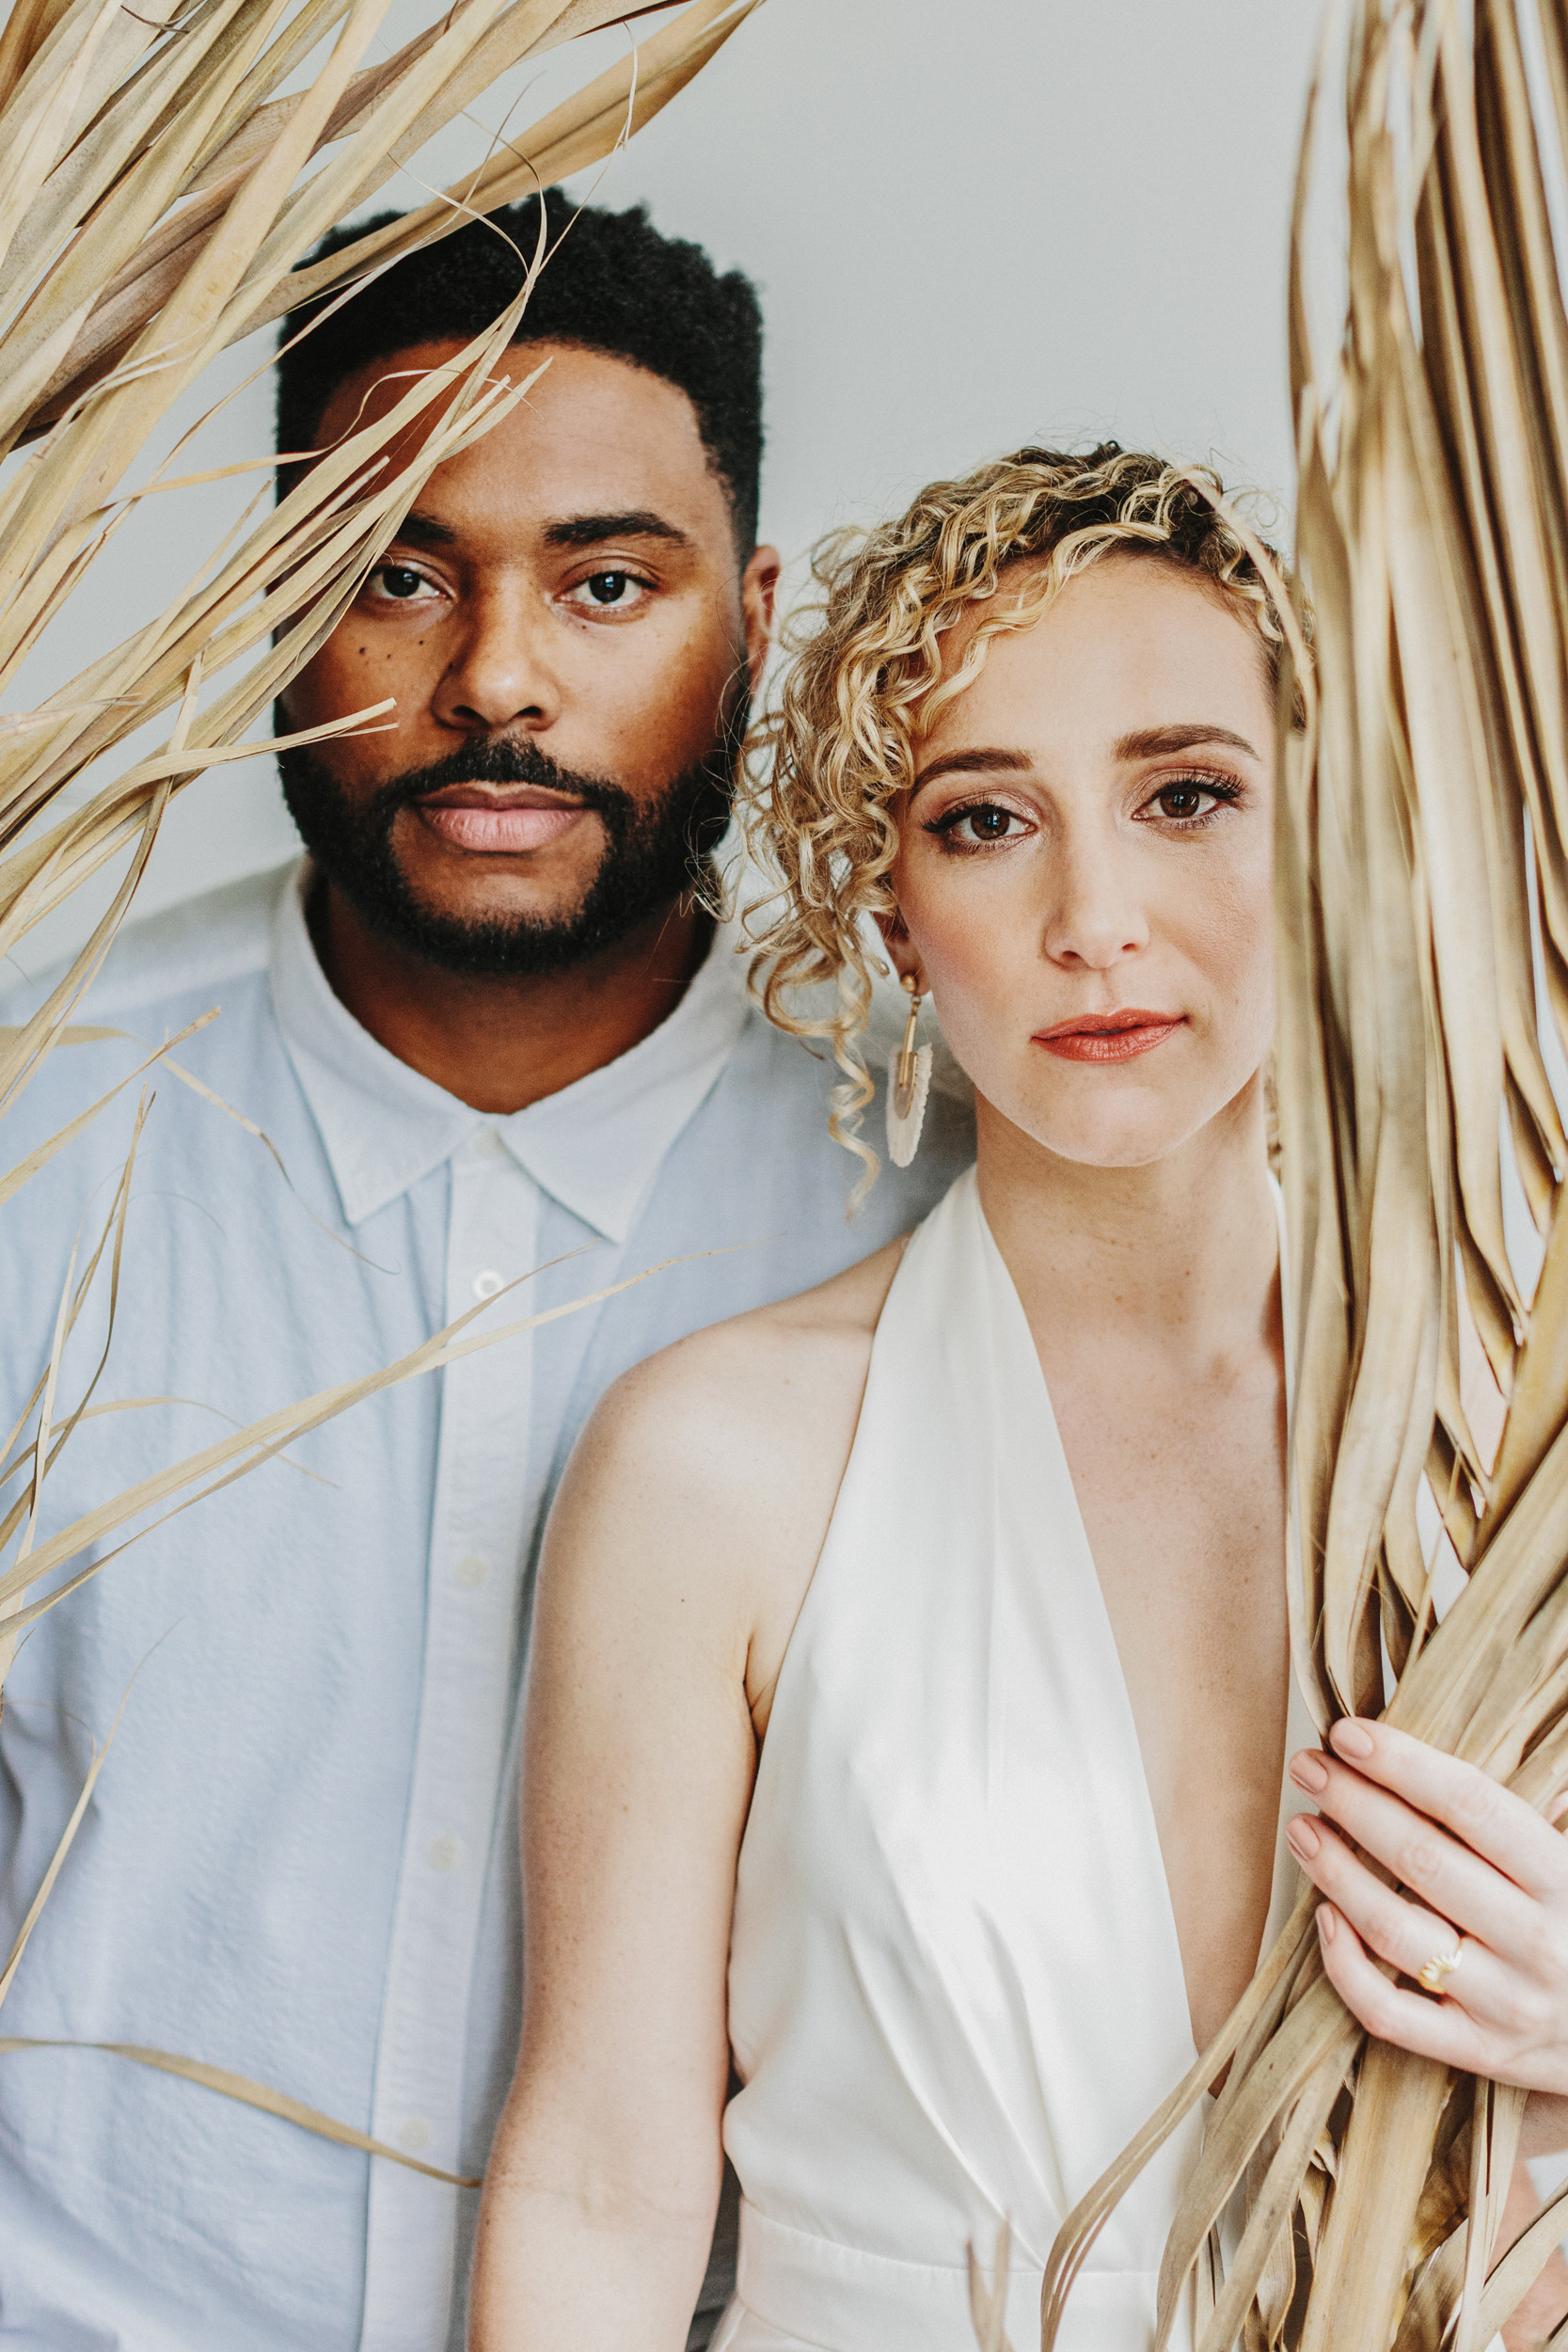 portrait of biracial bride and groom